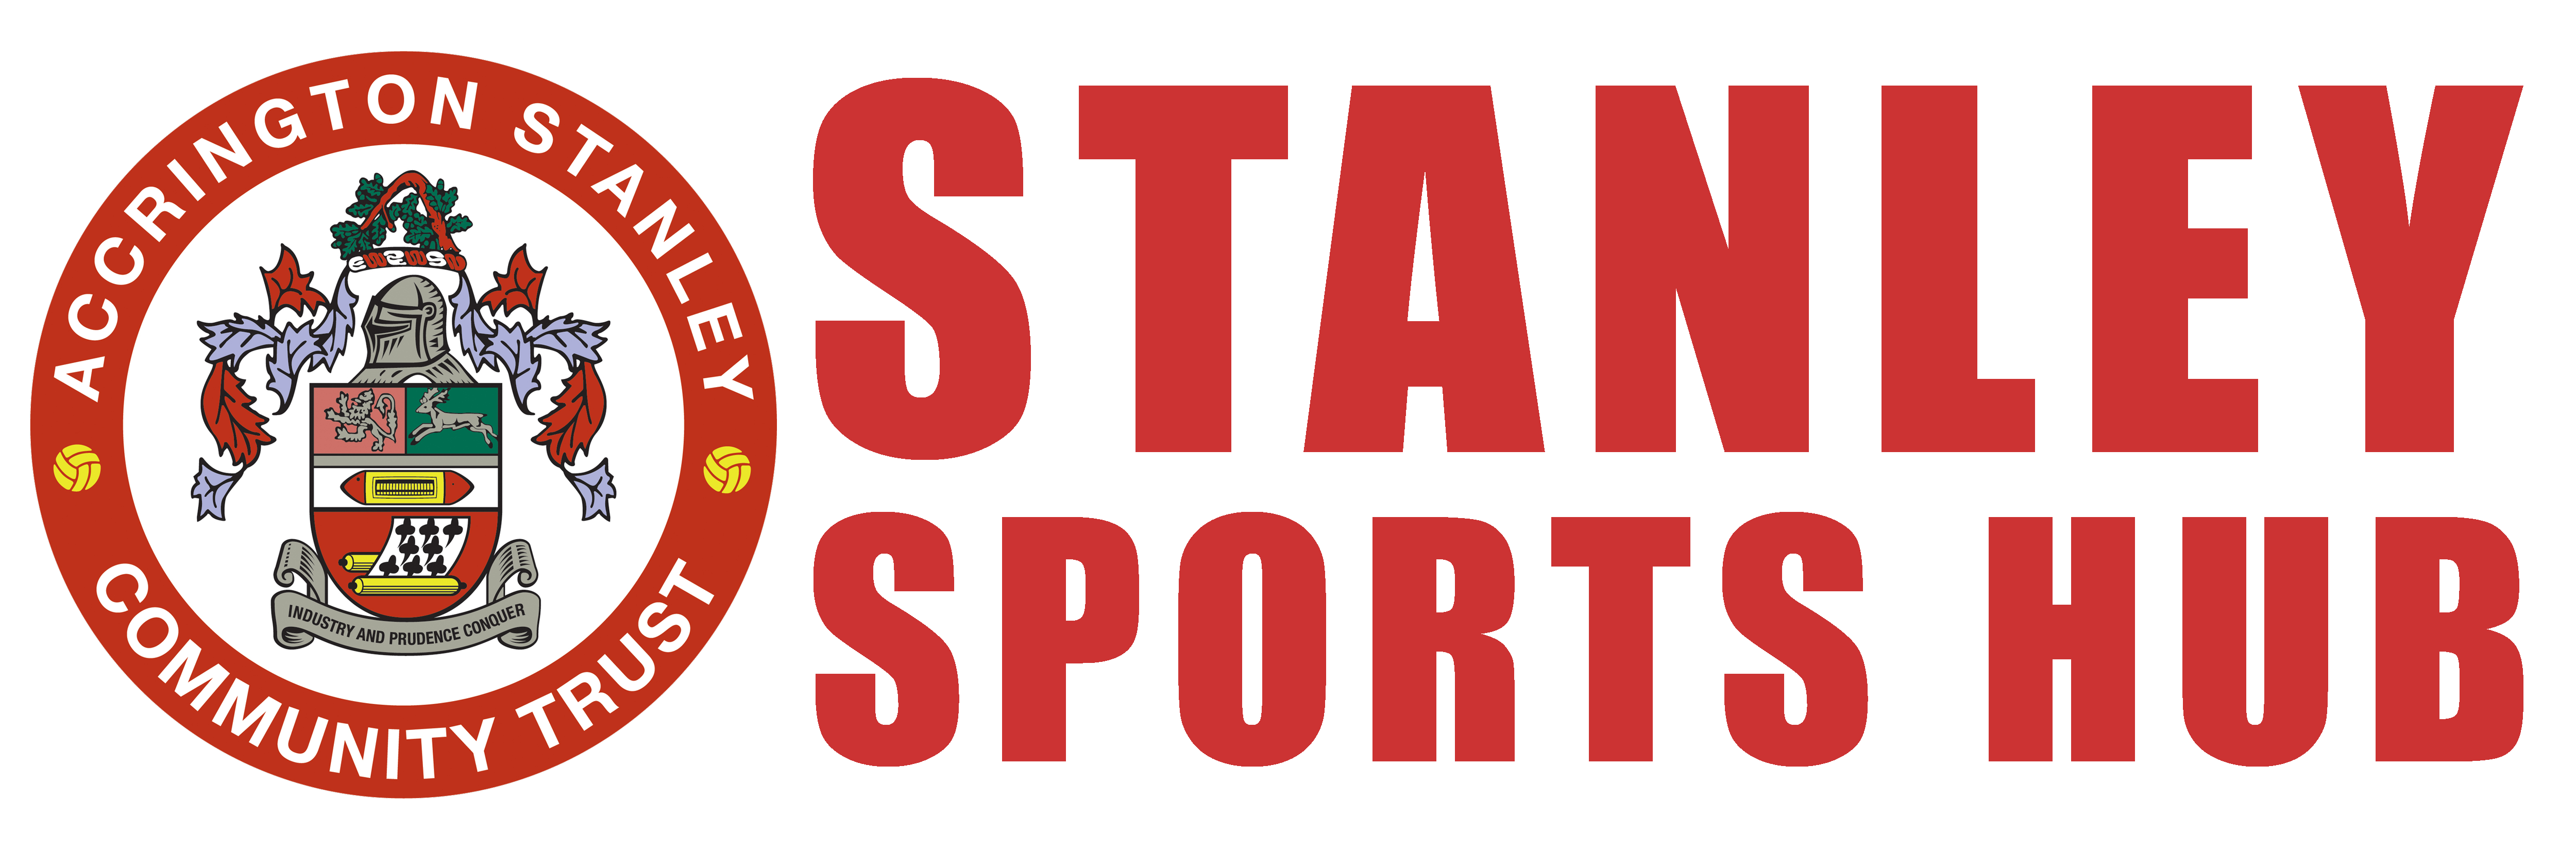 stanley sports hub